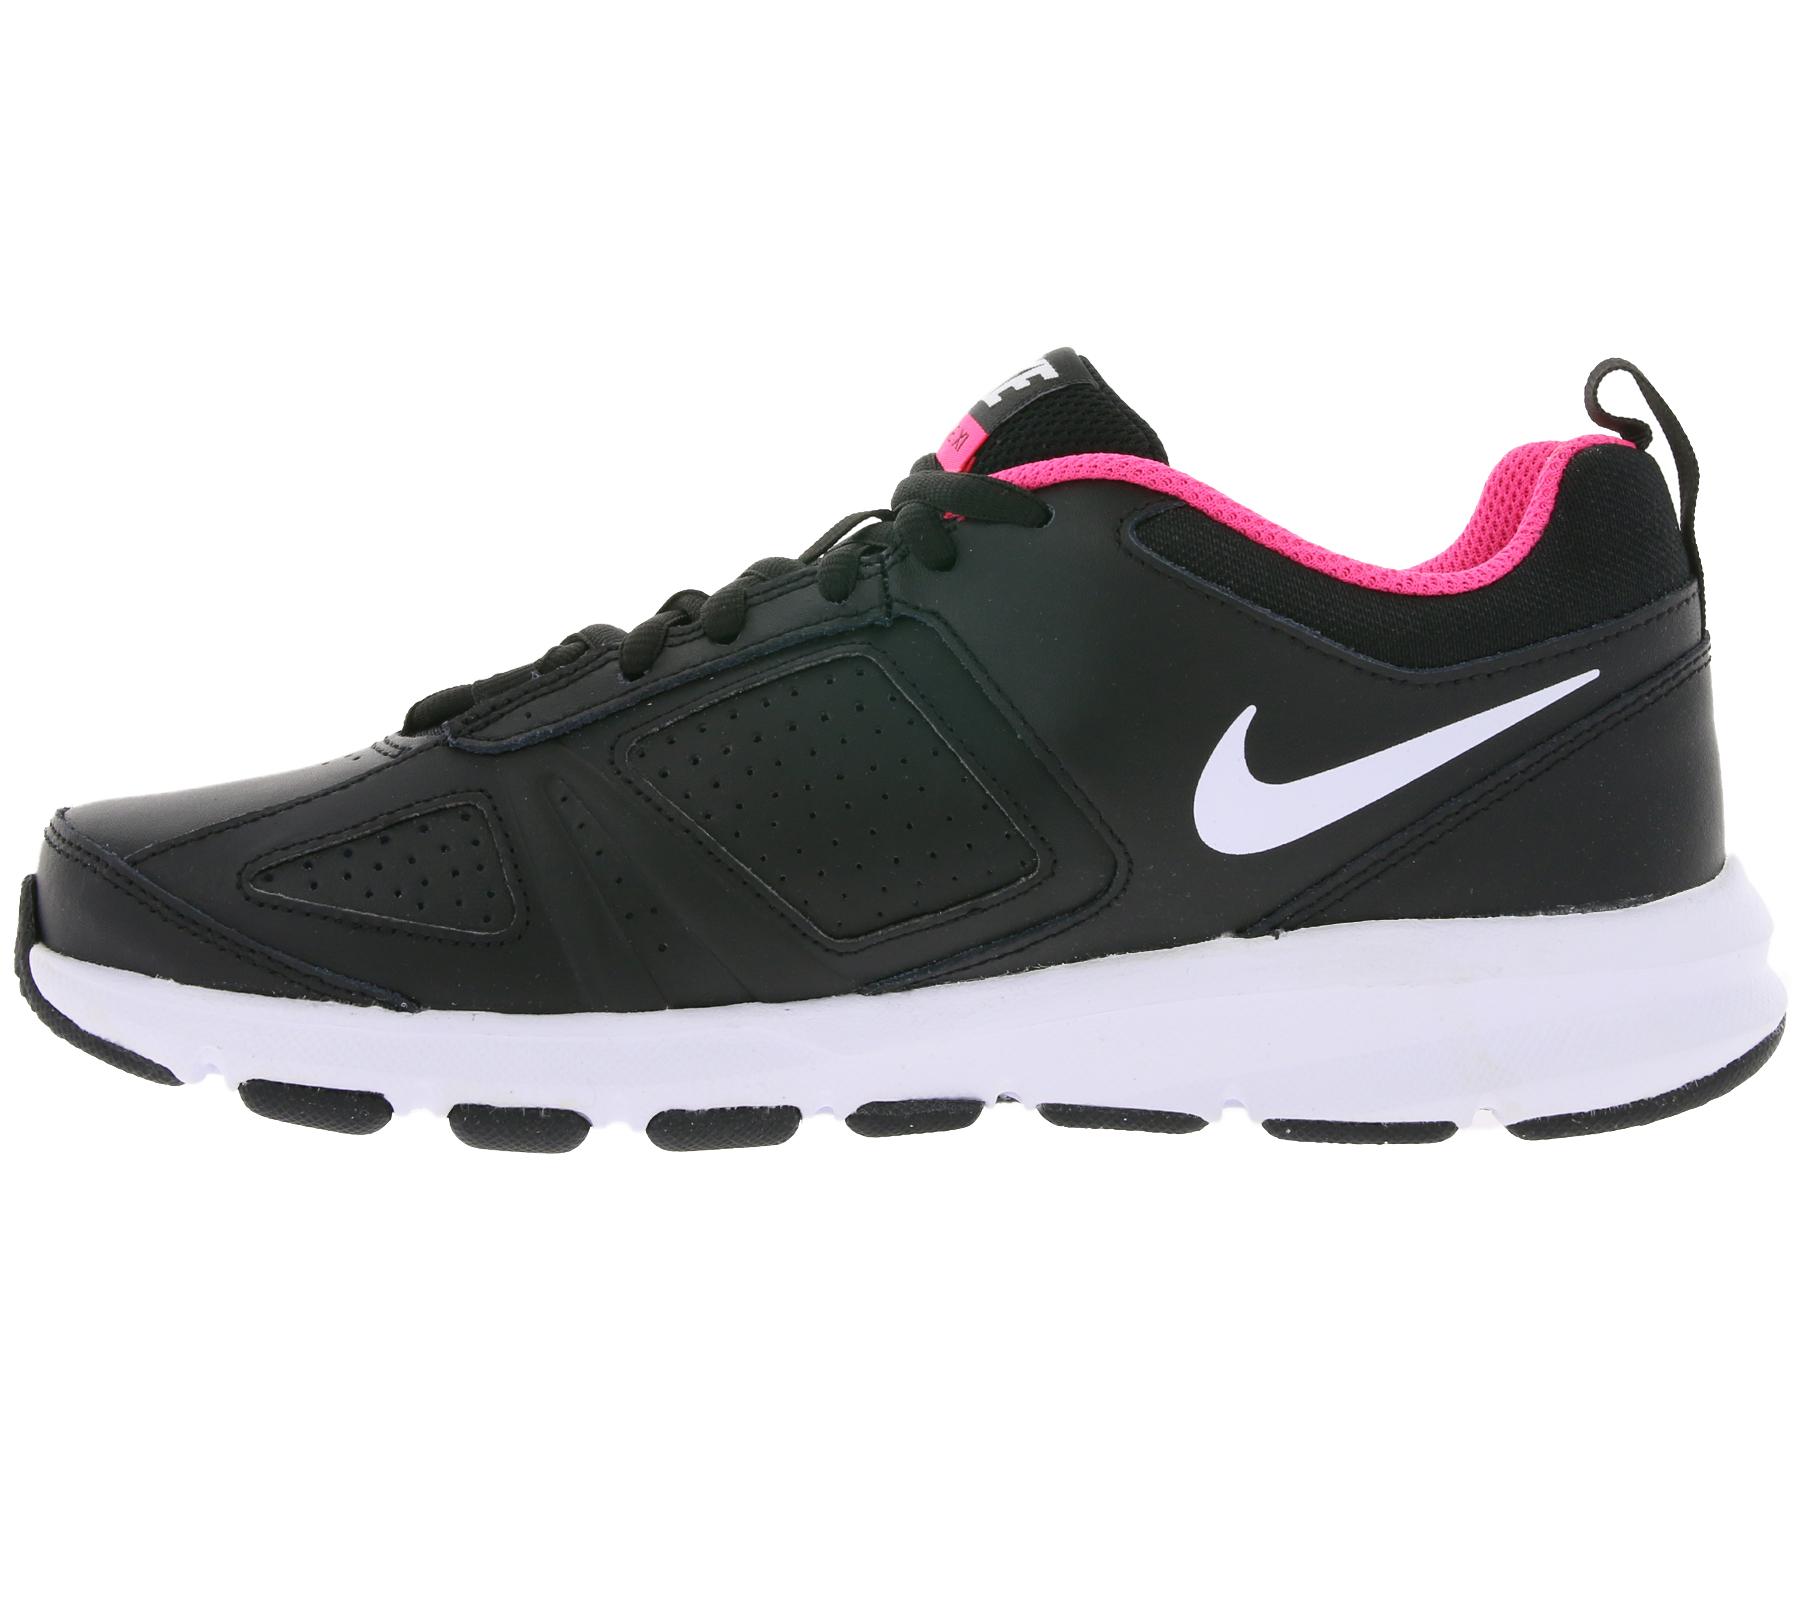 15206271baf985 NIKE Schuhe klassische Damen Laufschuhe Sportschuhe T-Lite XI Fitness  Schwarz